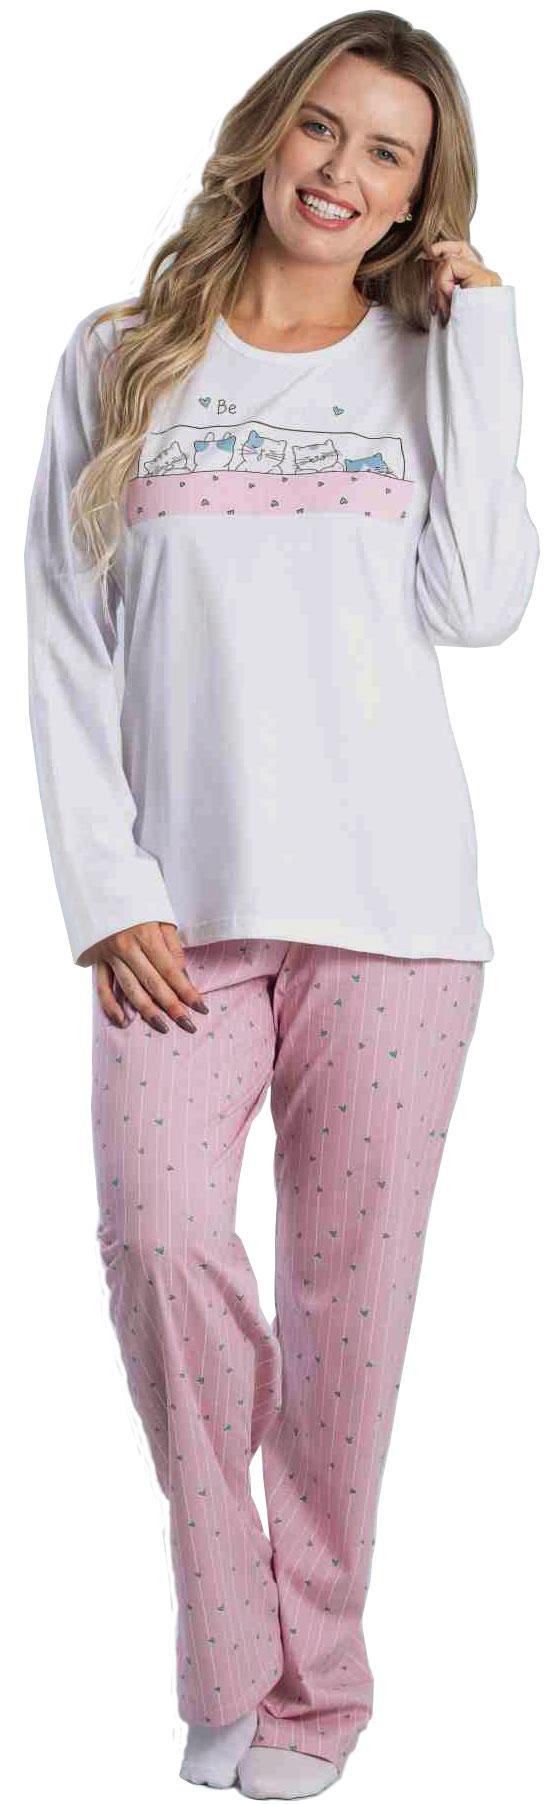 Pijama Happy Day Composê - 01500010